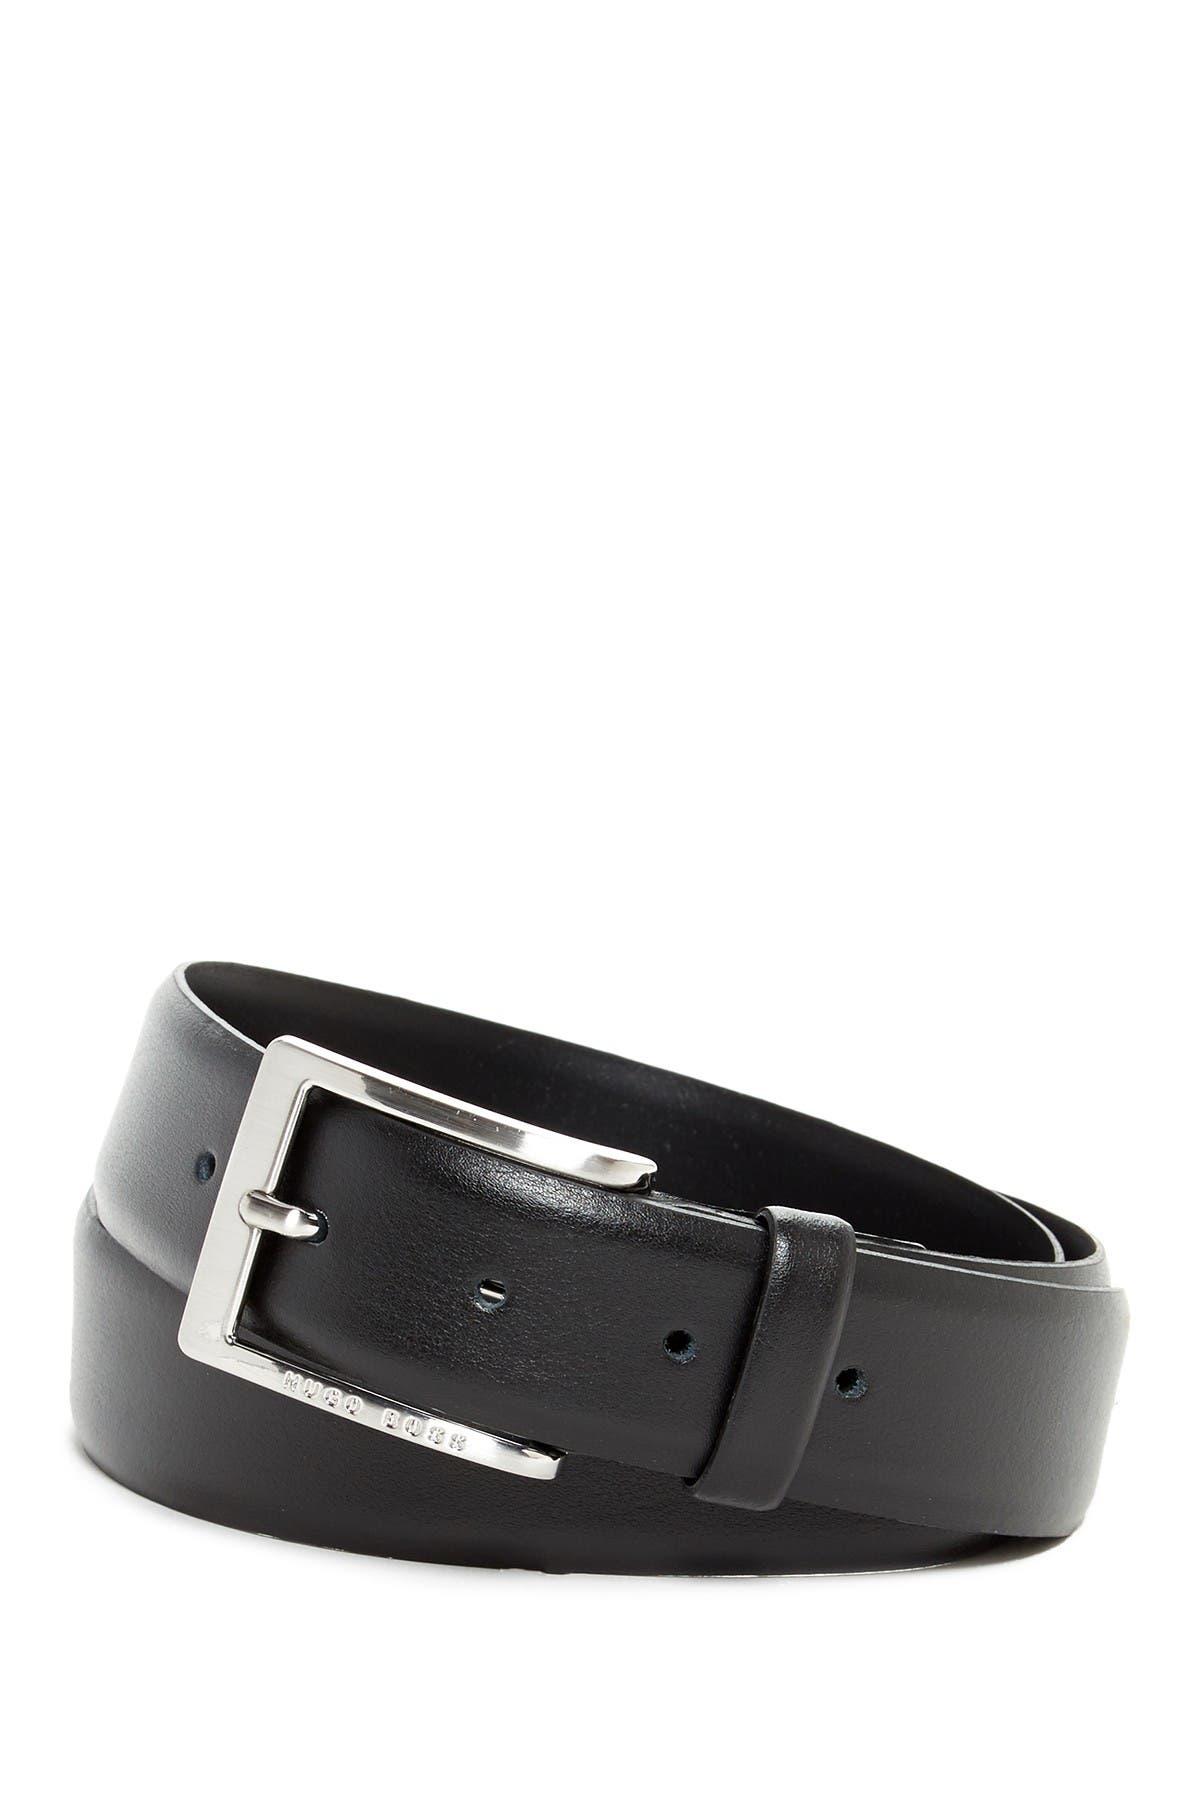 Image of BOSS Plain Leather Belt